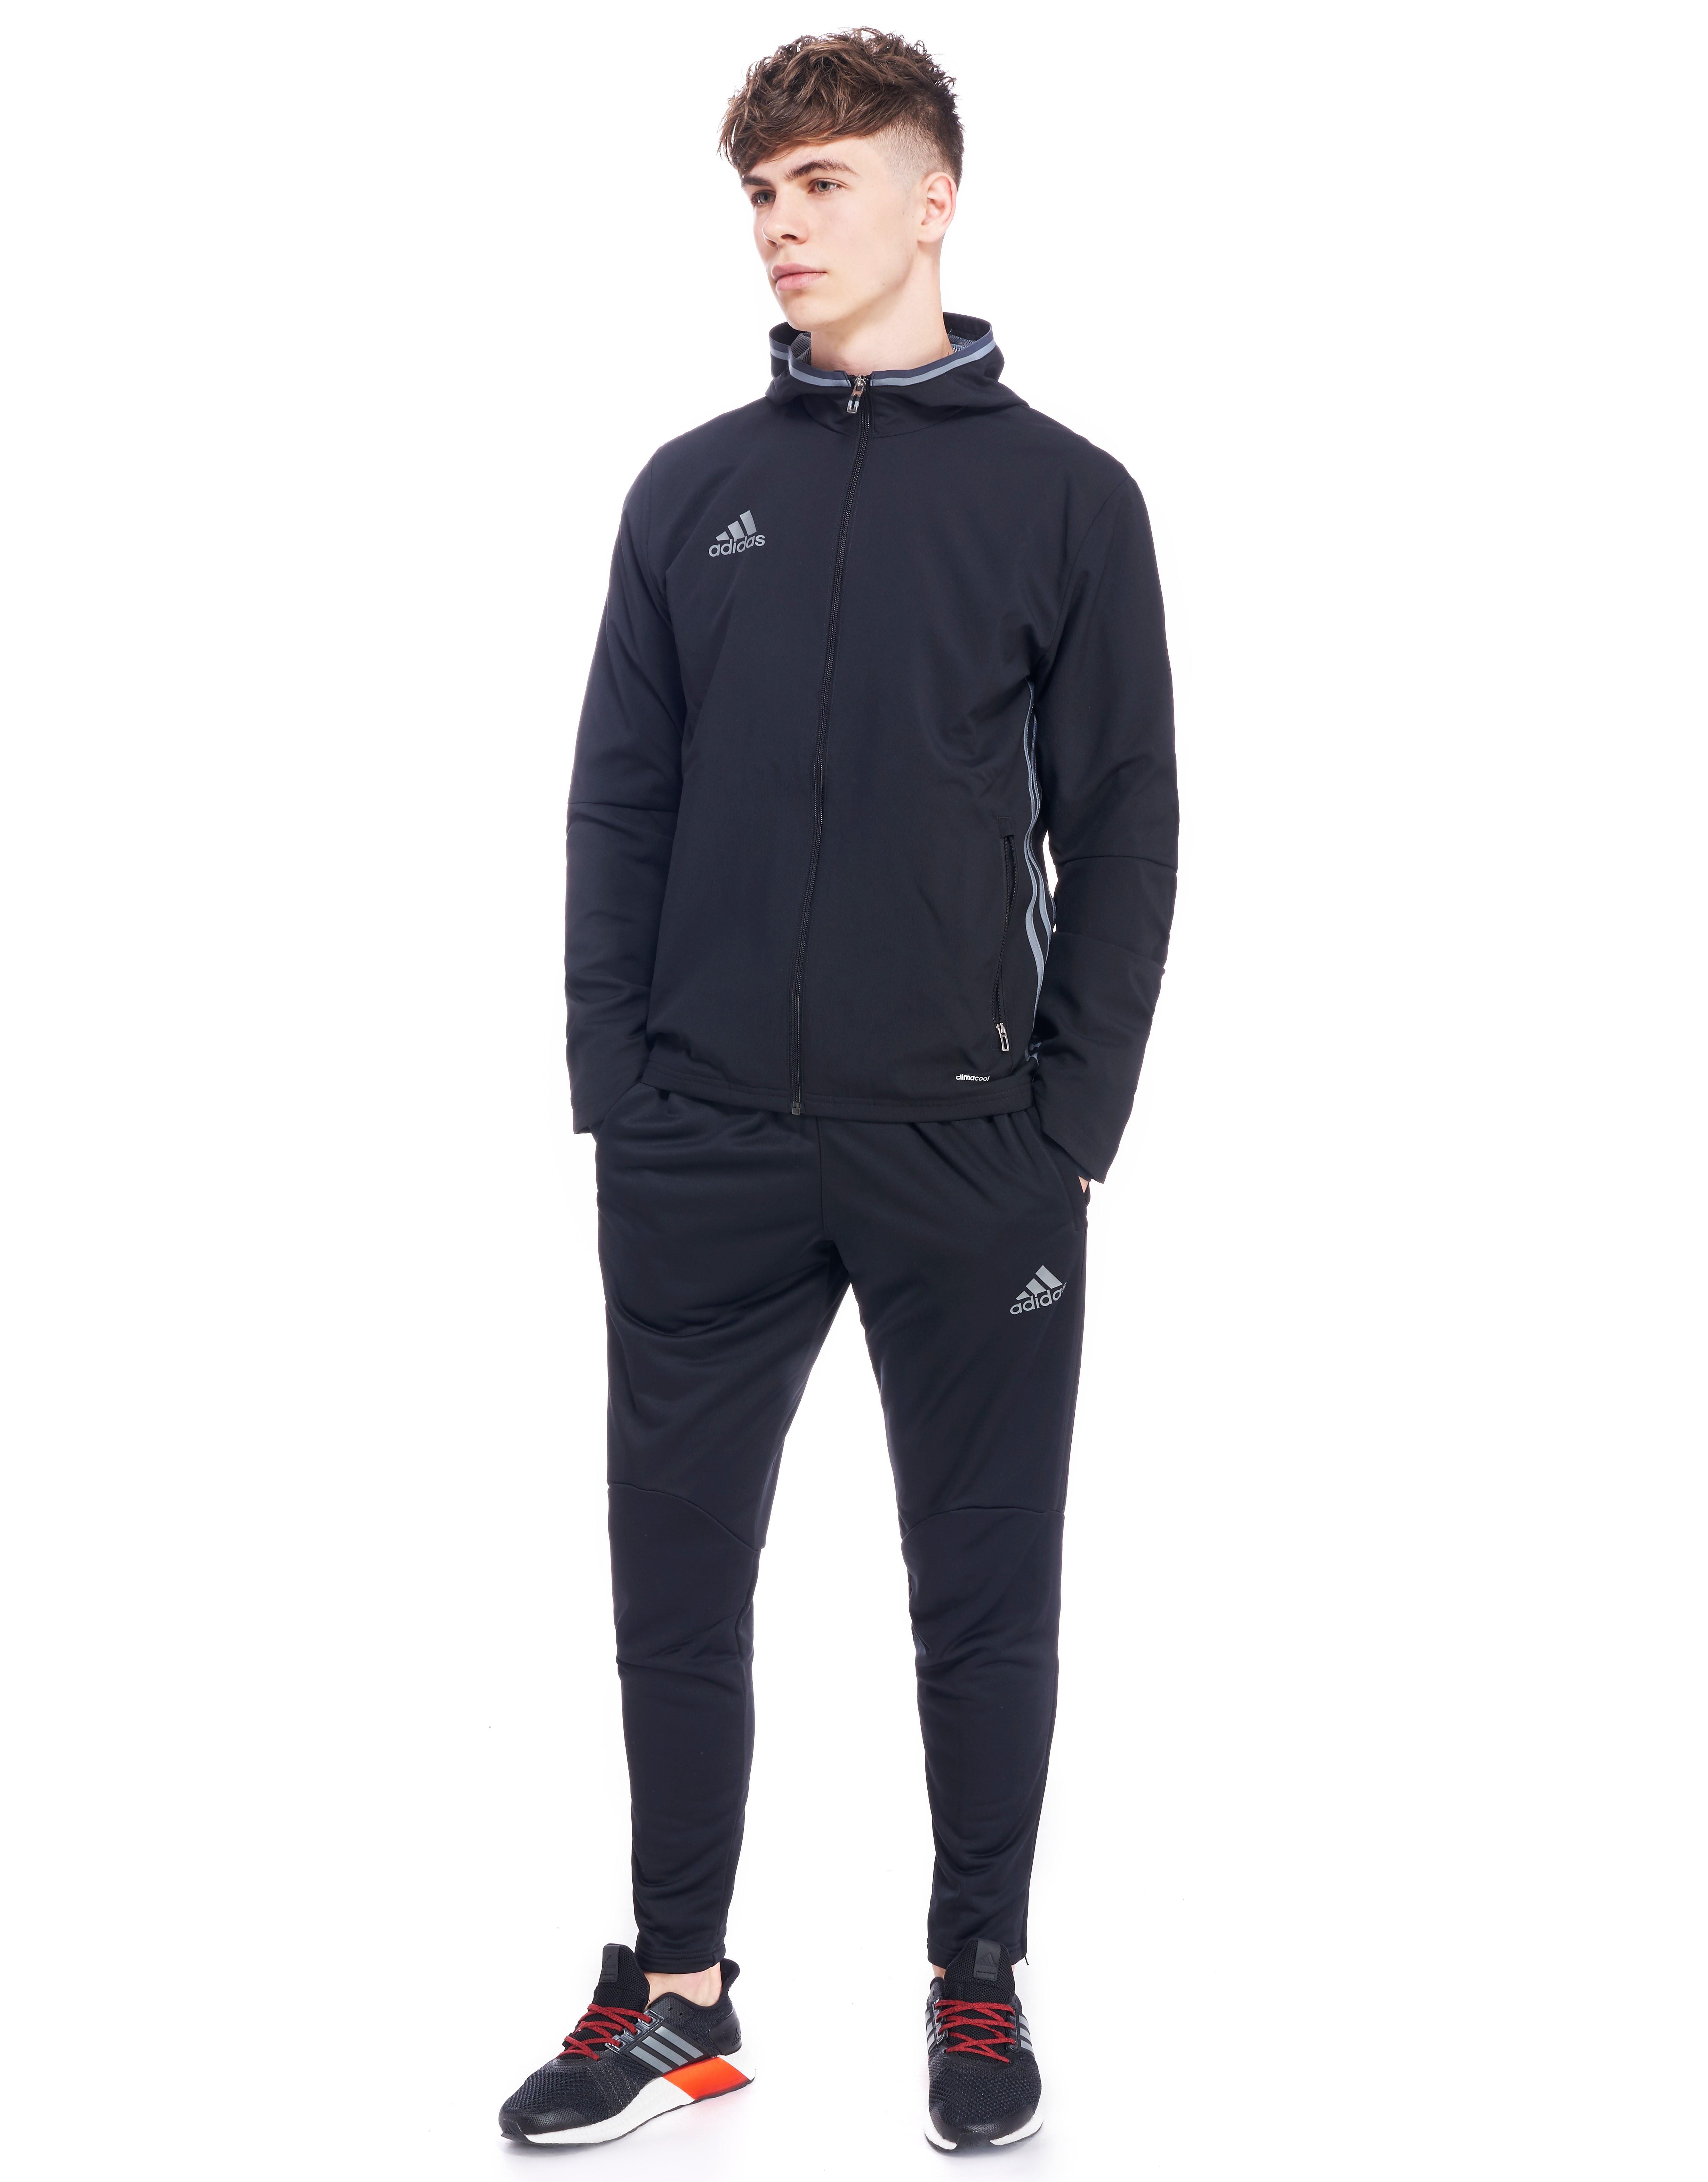 adidas Condivo 16 Poly Suit Black